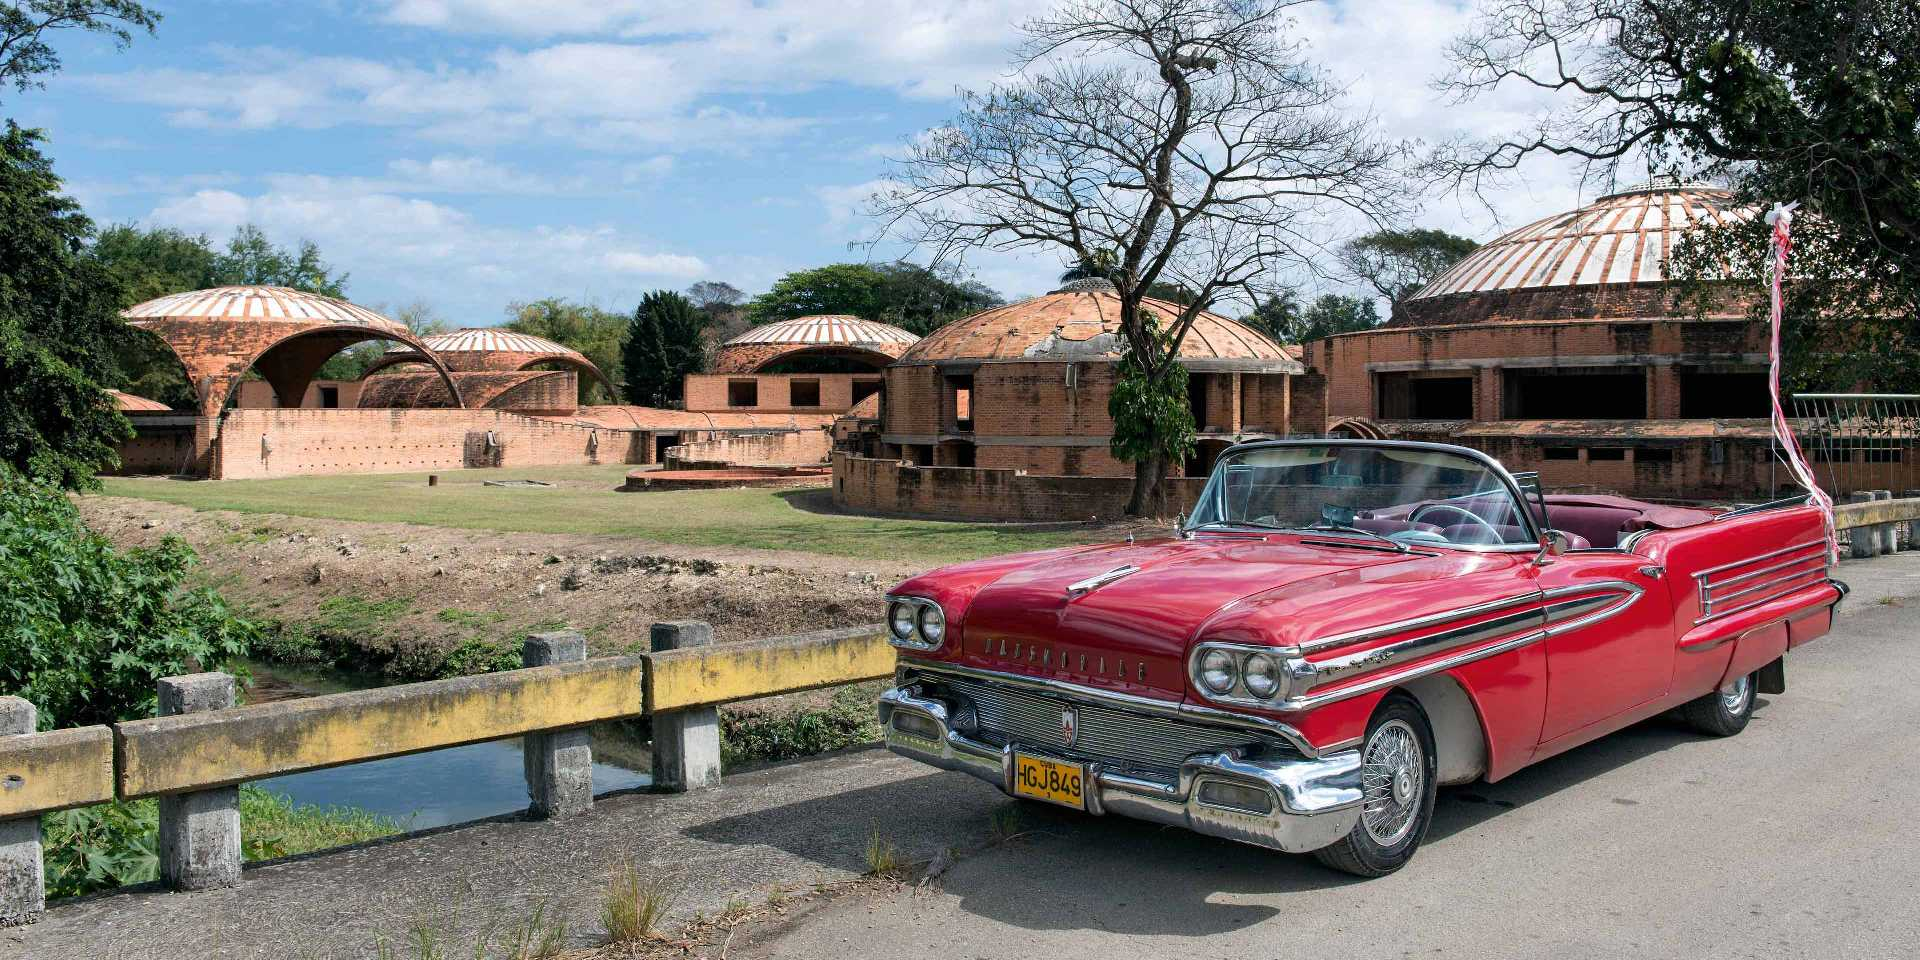 Havana, Autos & Architecture  - CA2 2013 DSC3116 35